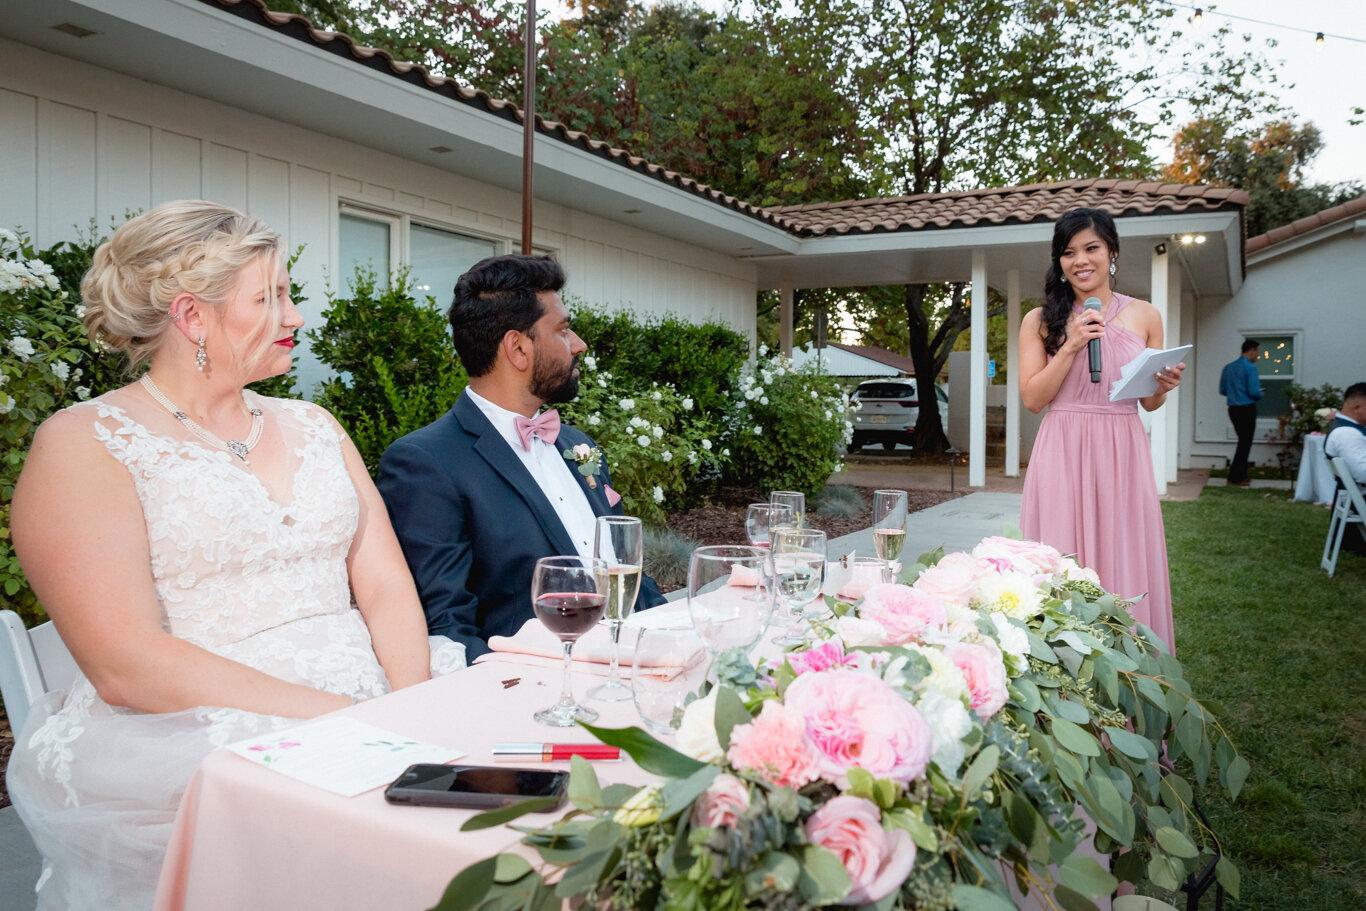 2019.08.24_Emily-Ashir-Wedding-at-the-Maples-6300.jpg